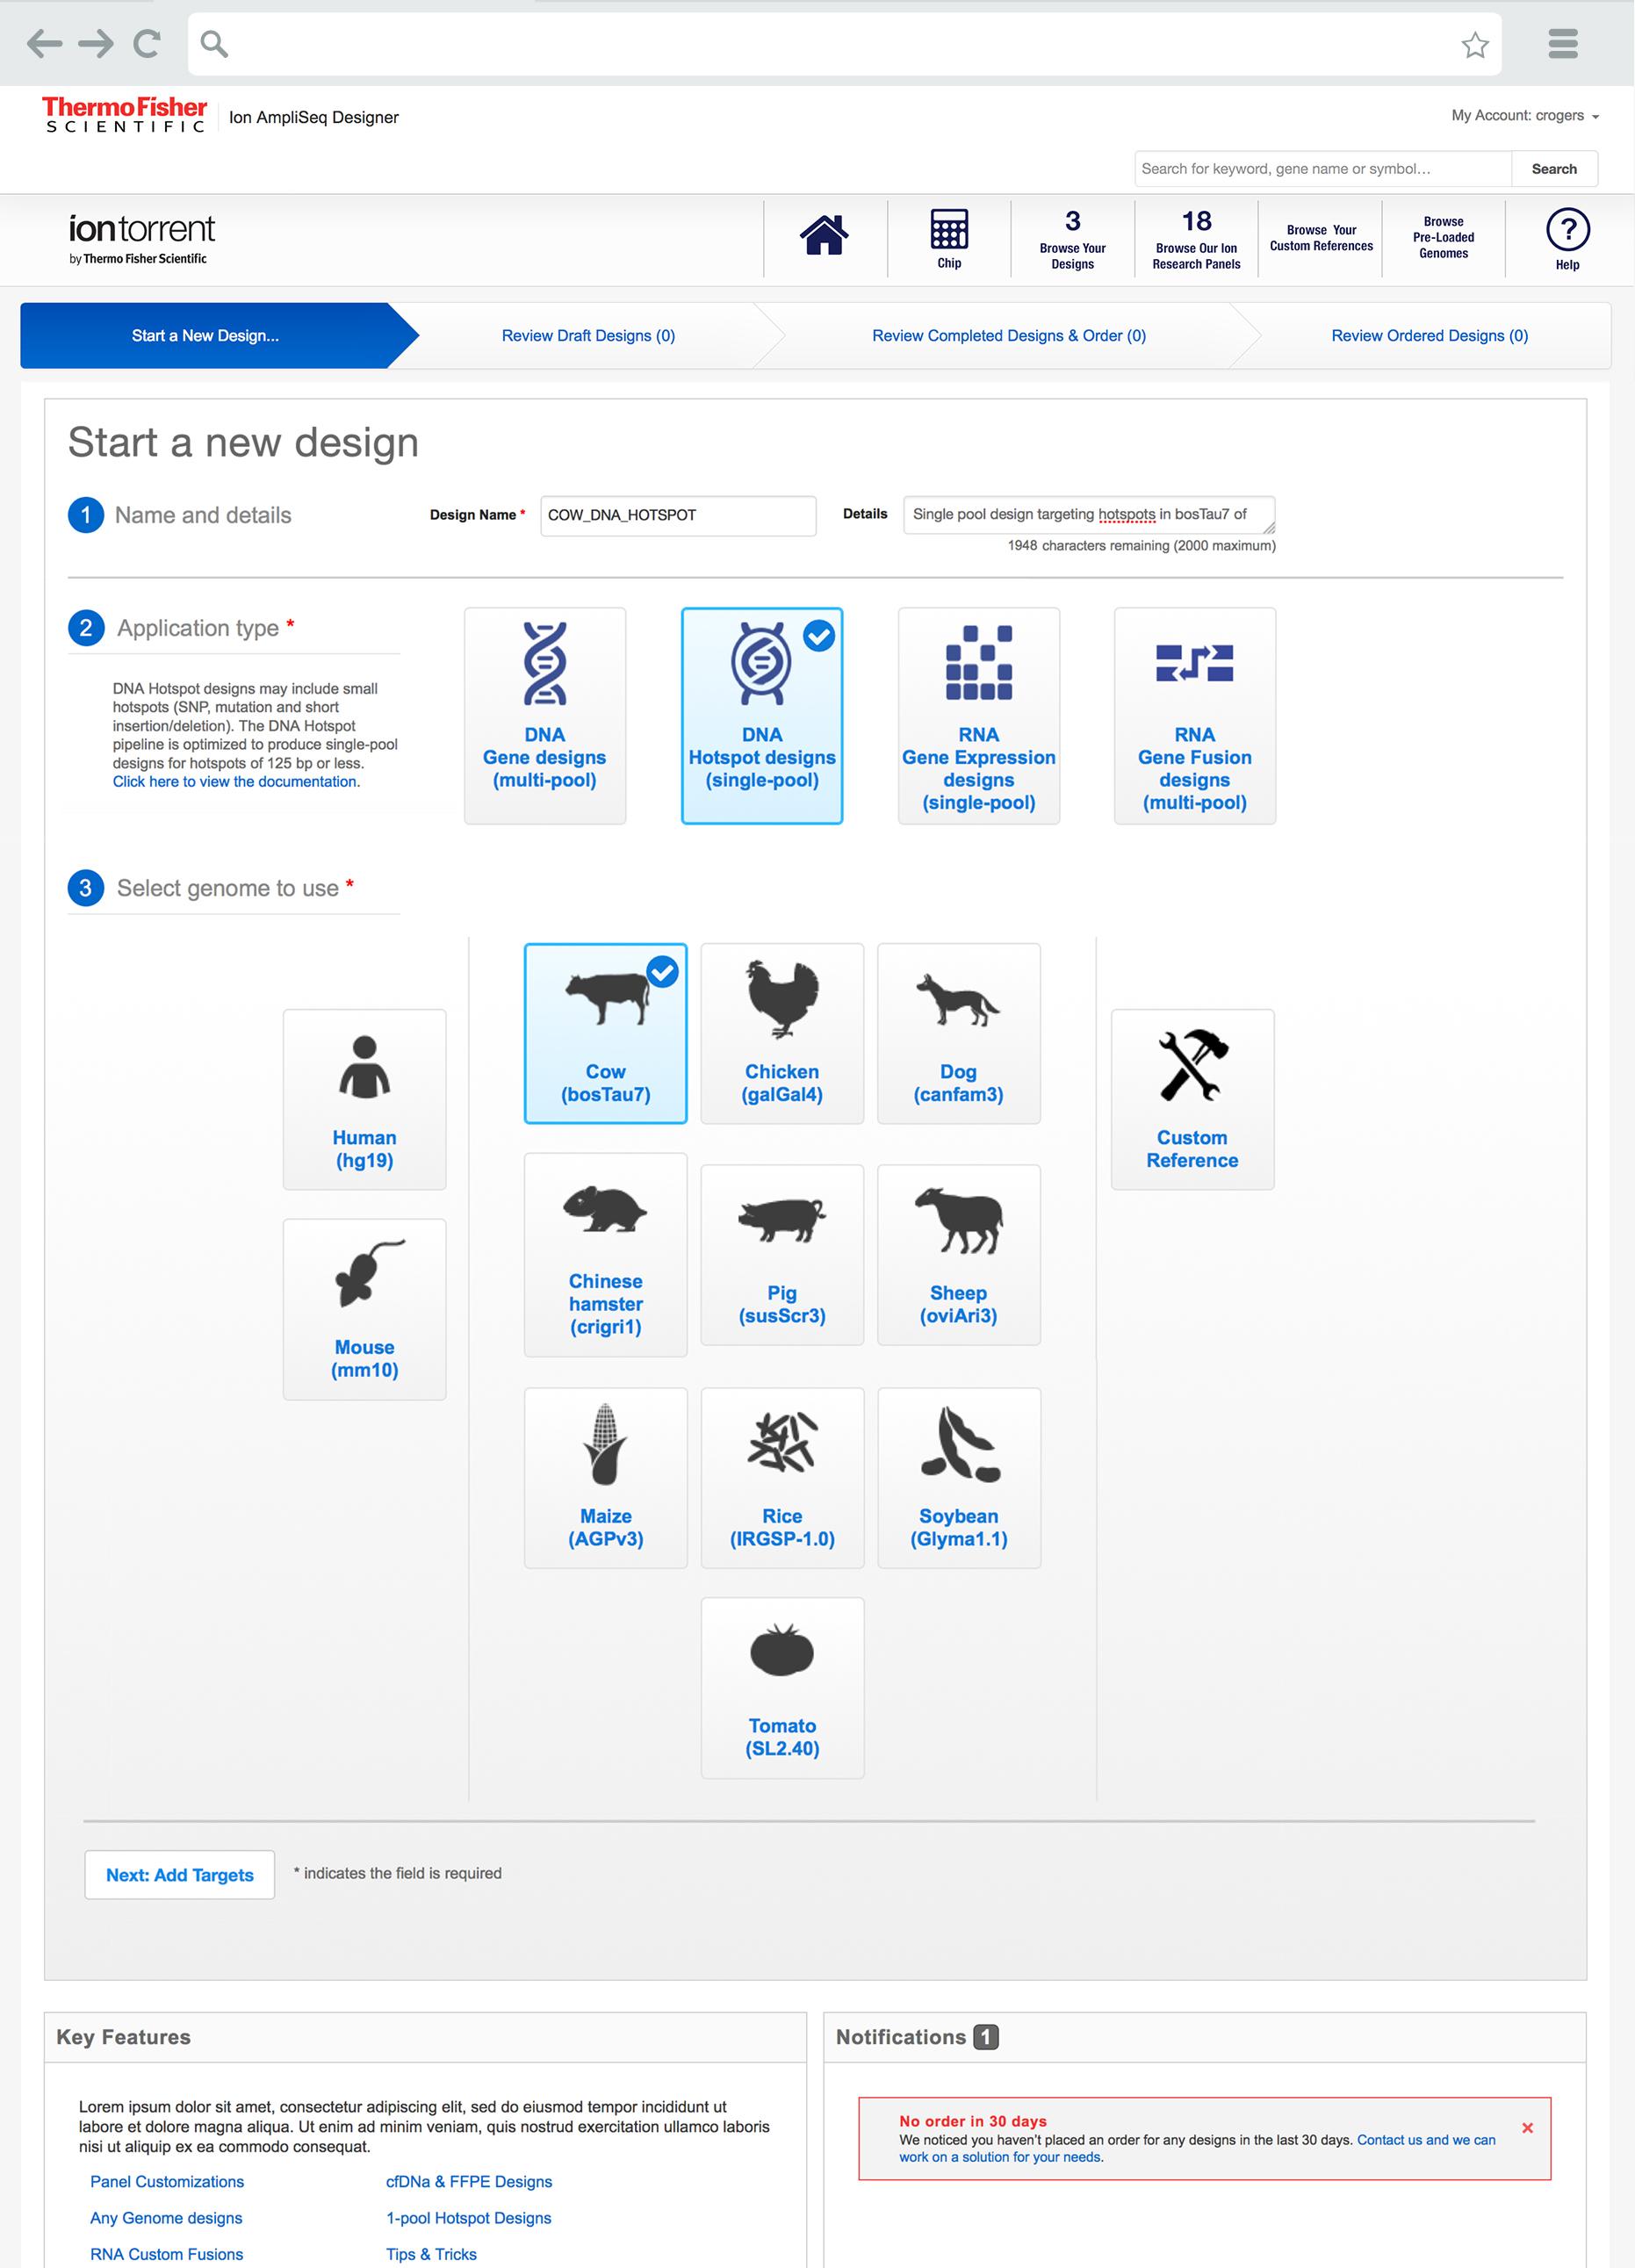 Ion Torrent New Design Screen